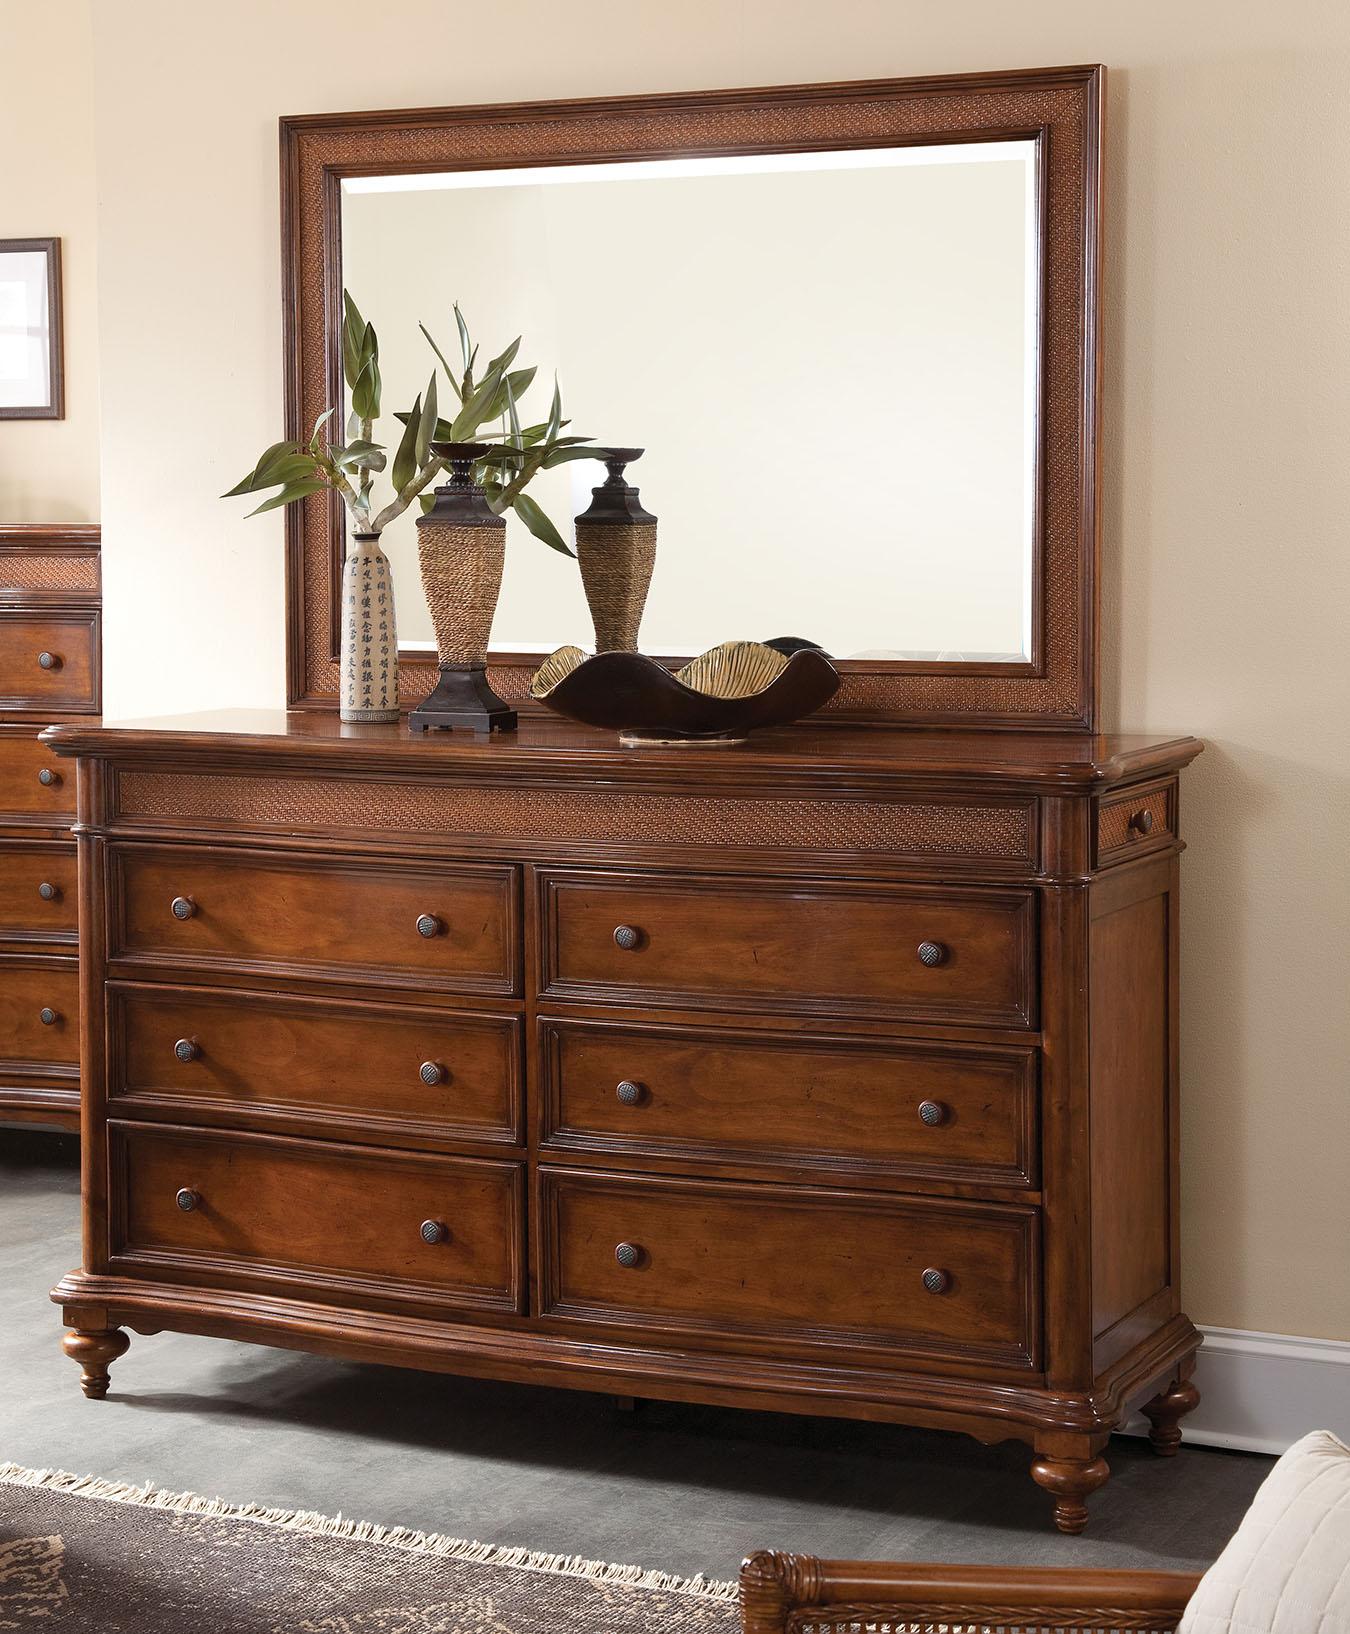 6000-280 Dresser_mirror-web.jpg